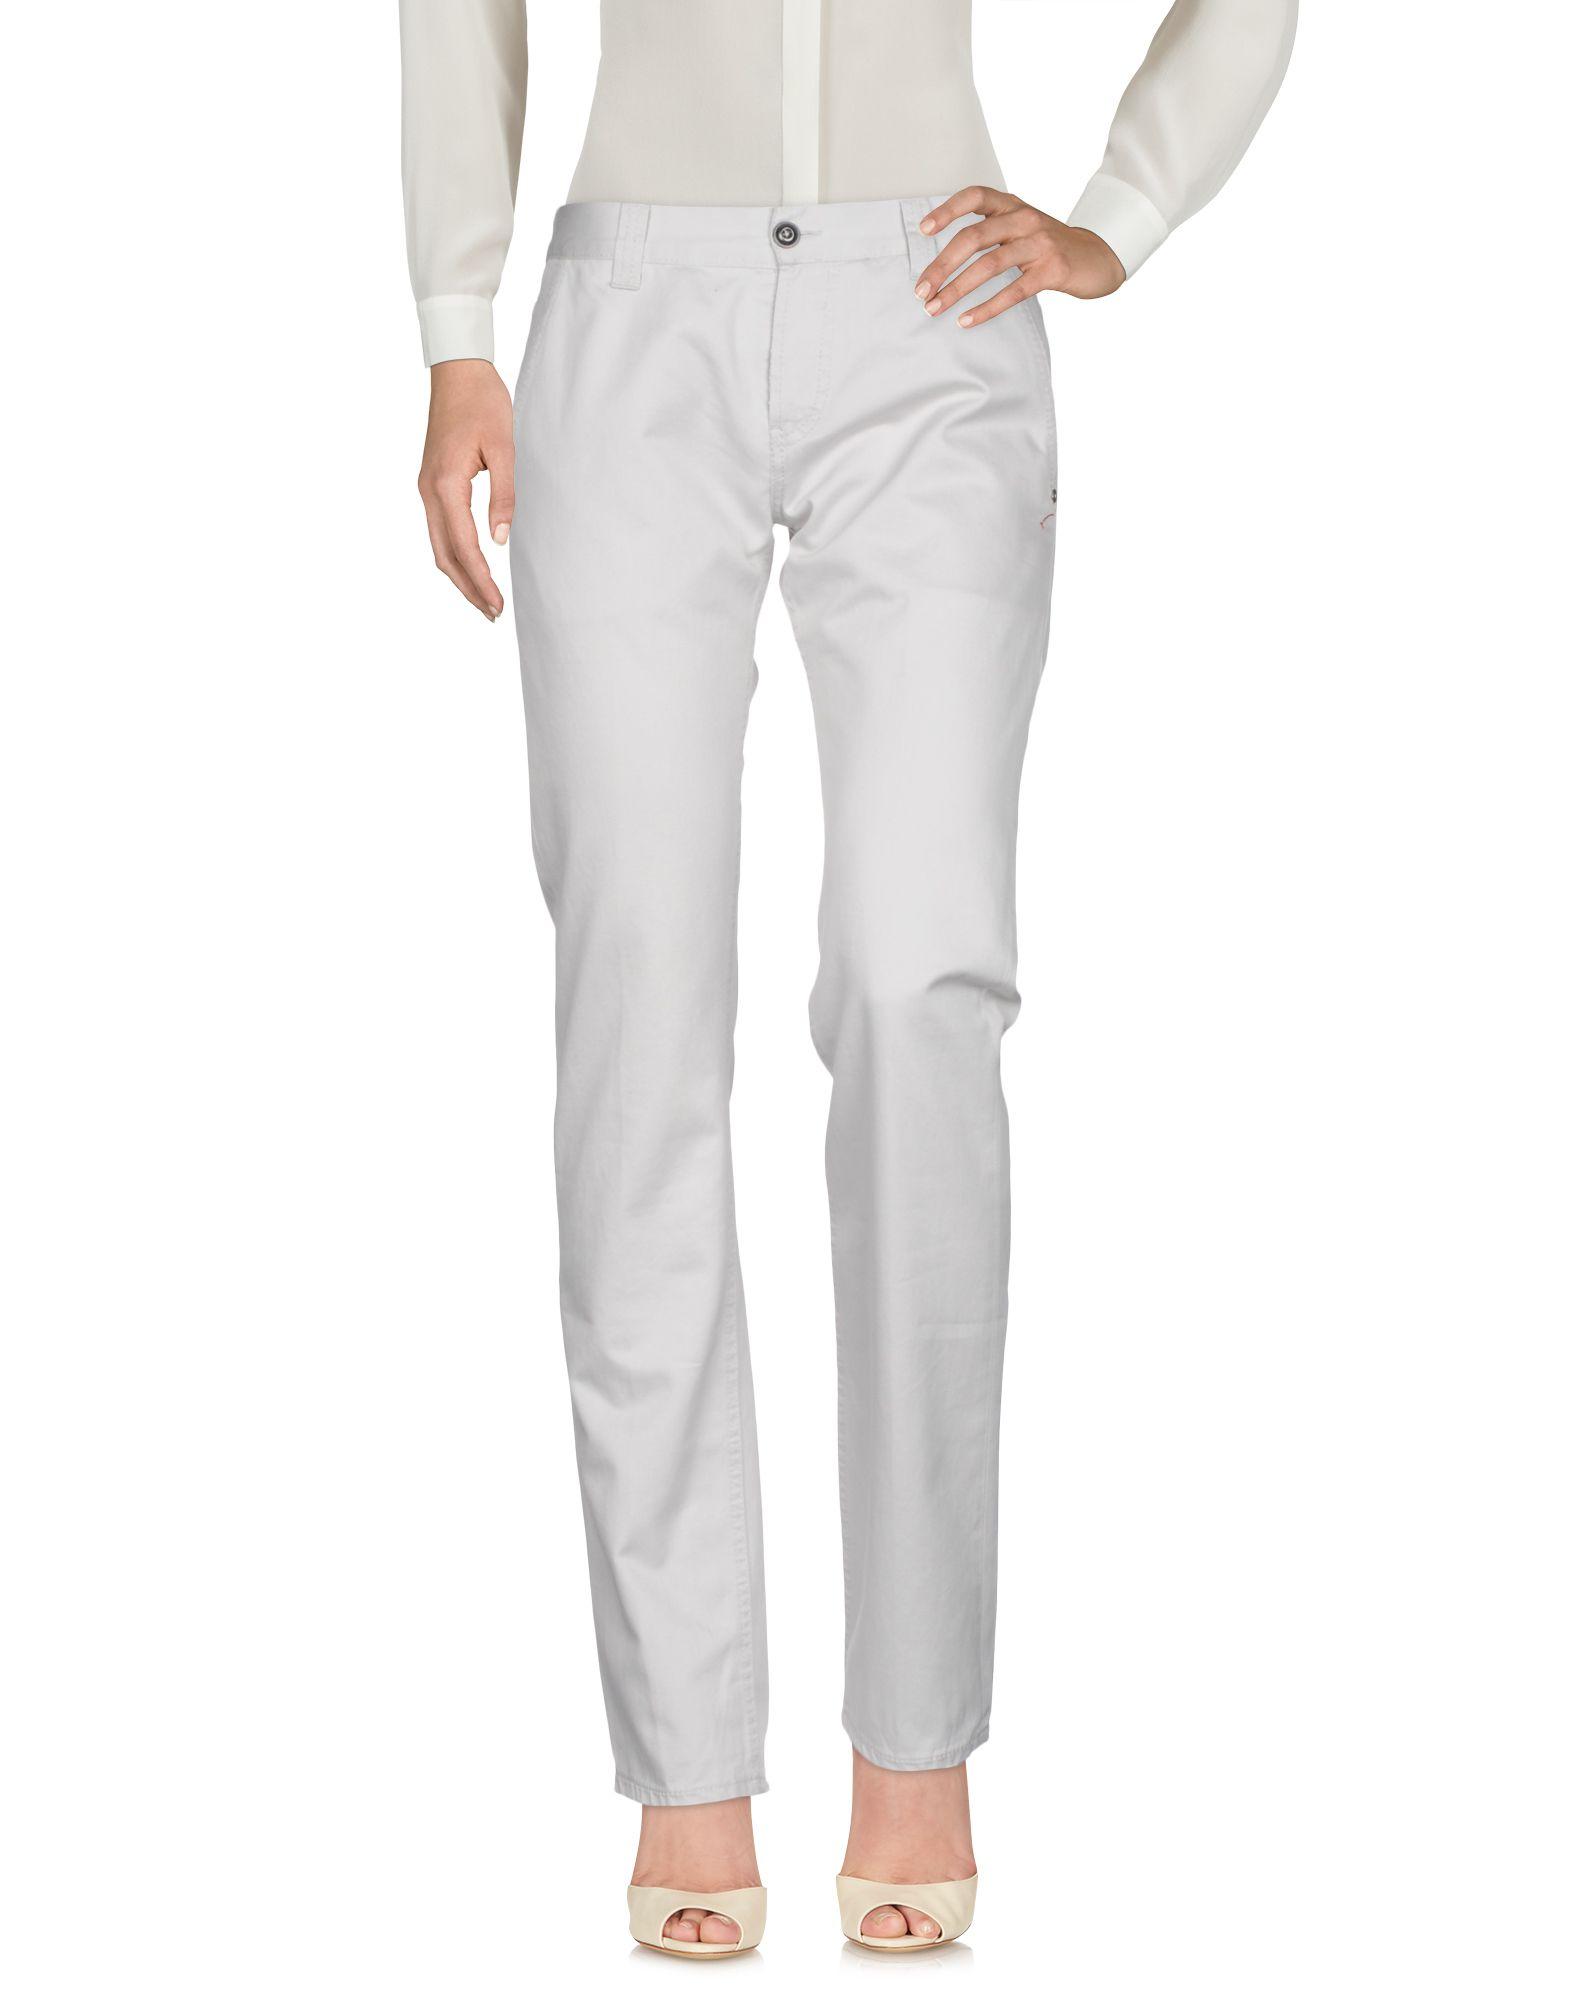 Pantalone Dondup Donna - Acquista online su JXLmEBJ4Q